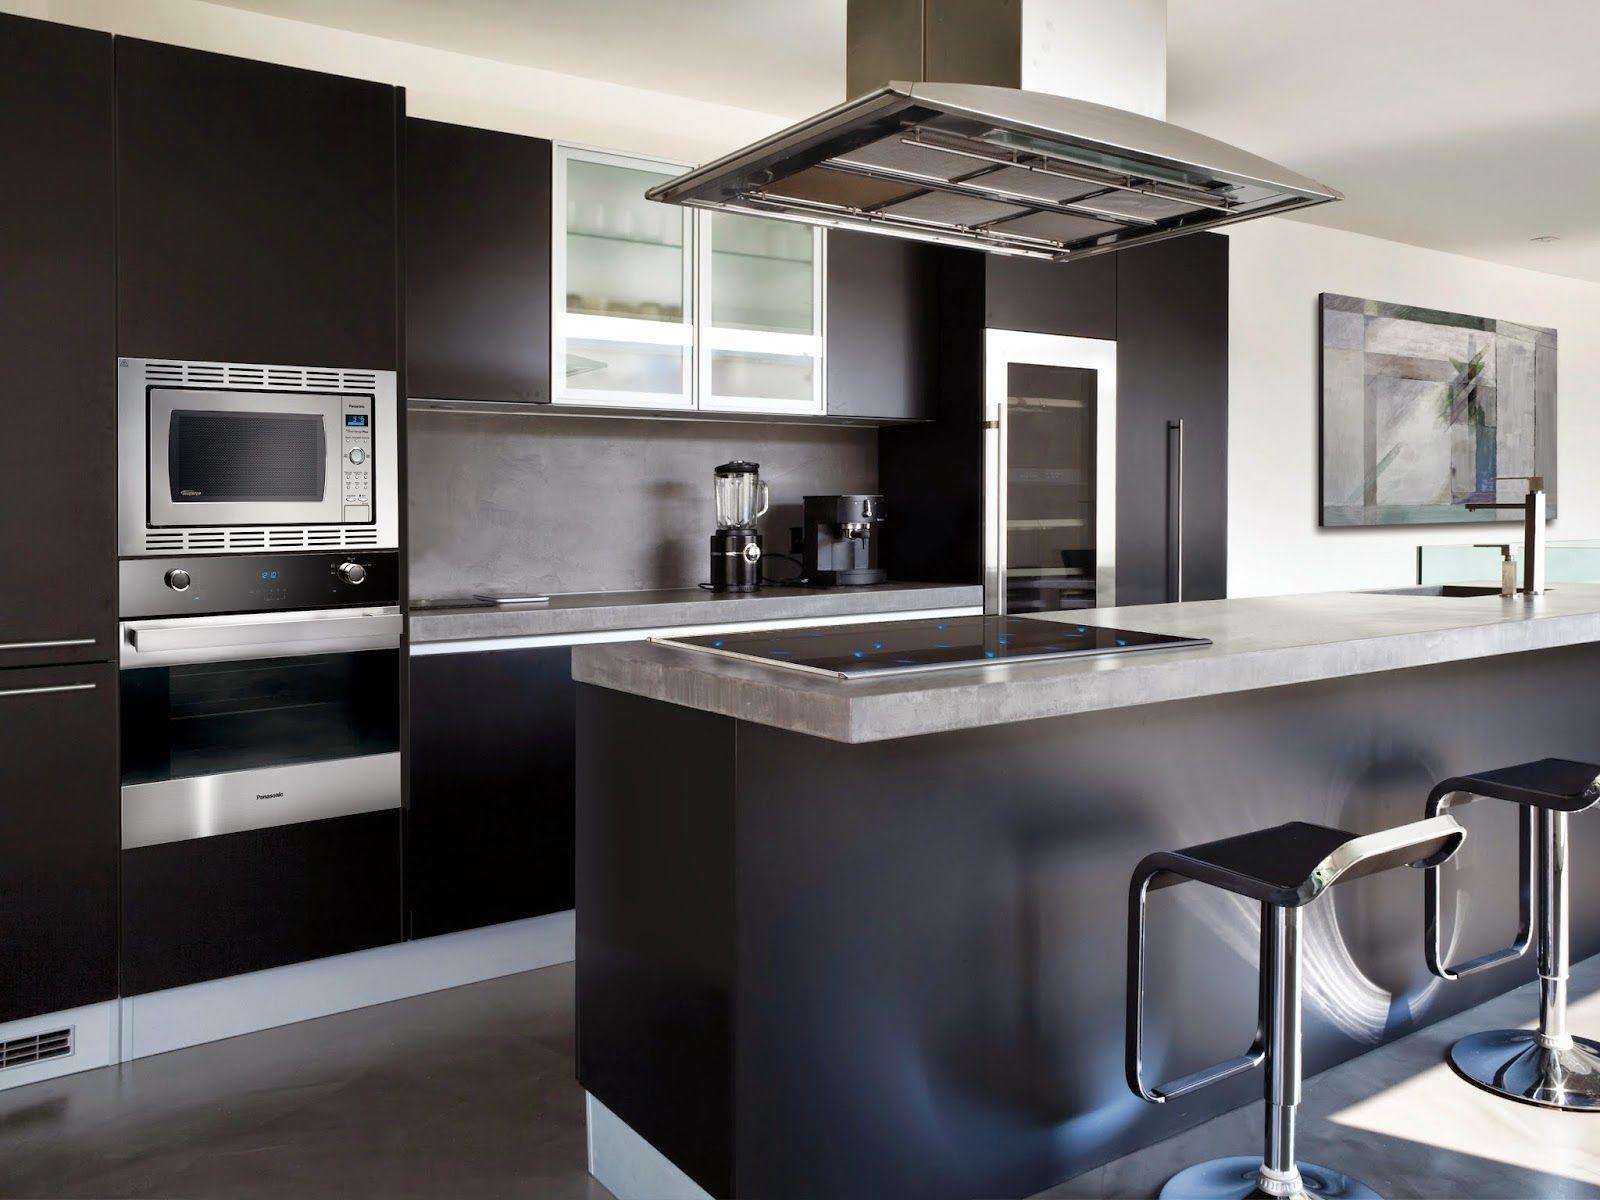 Cozinhas kitchens pesquisa google cocina pinterest